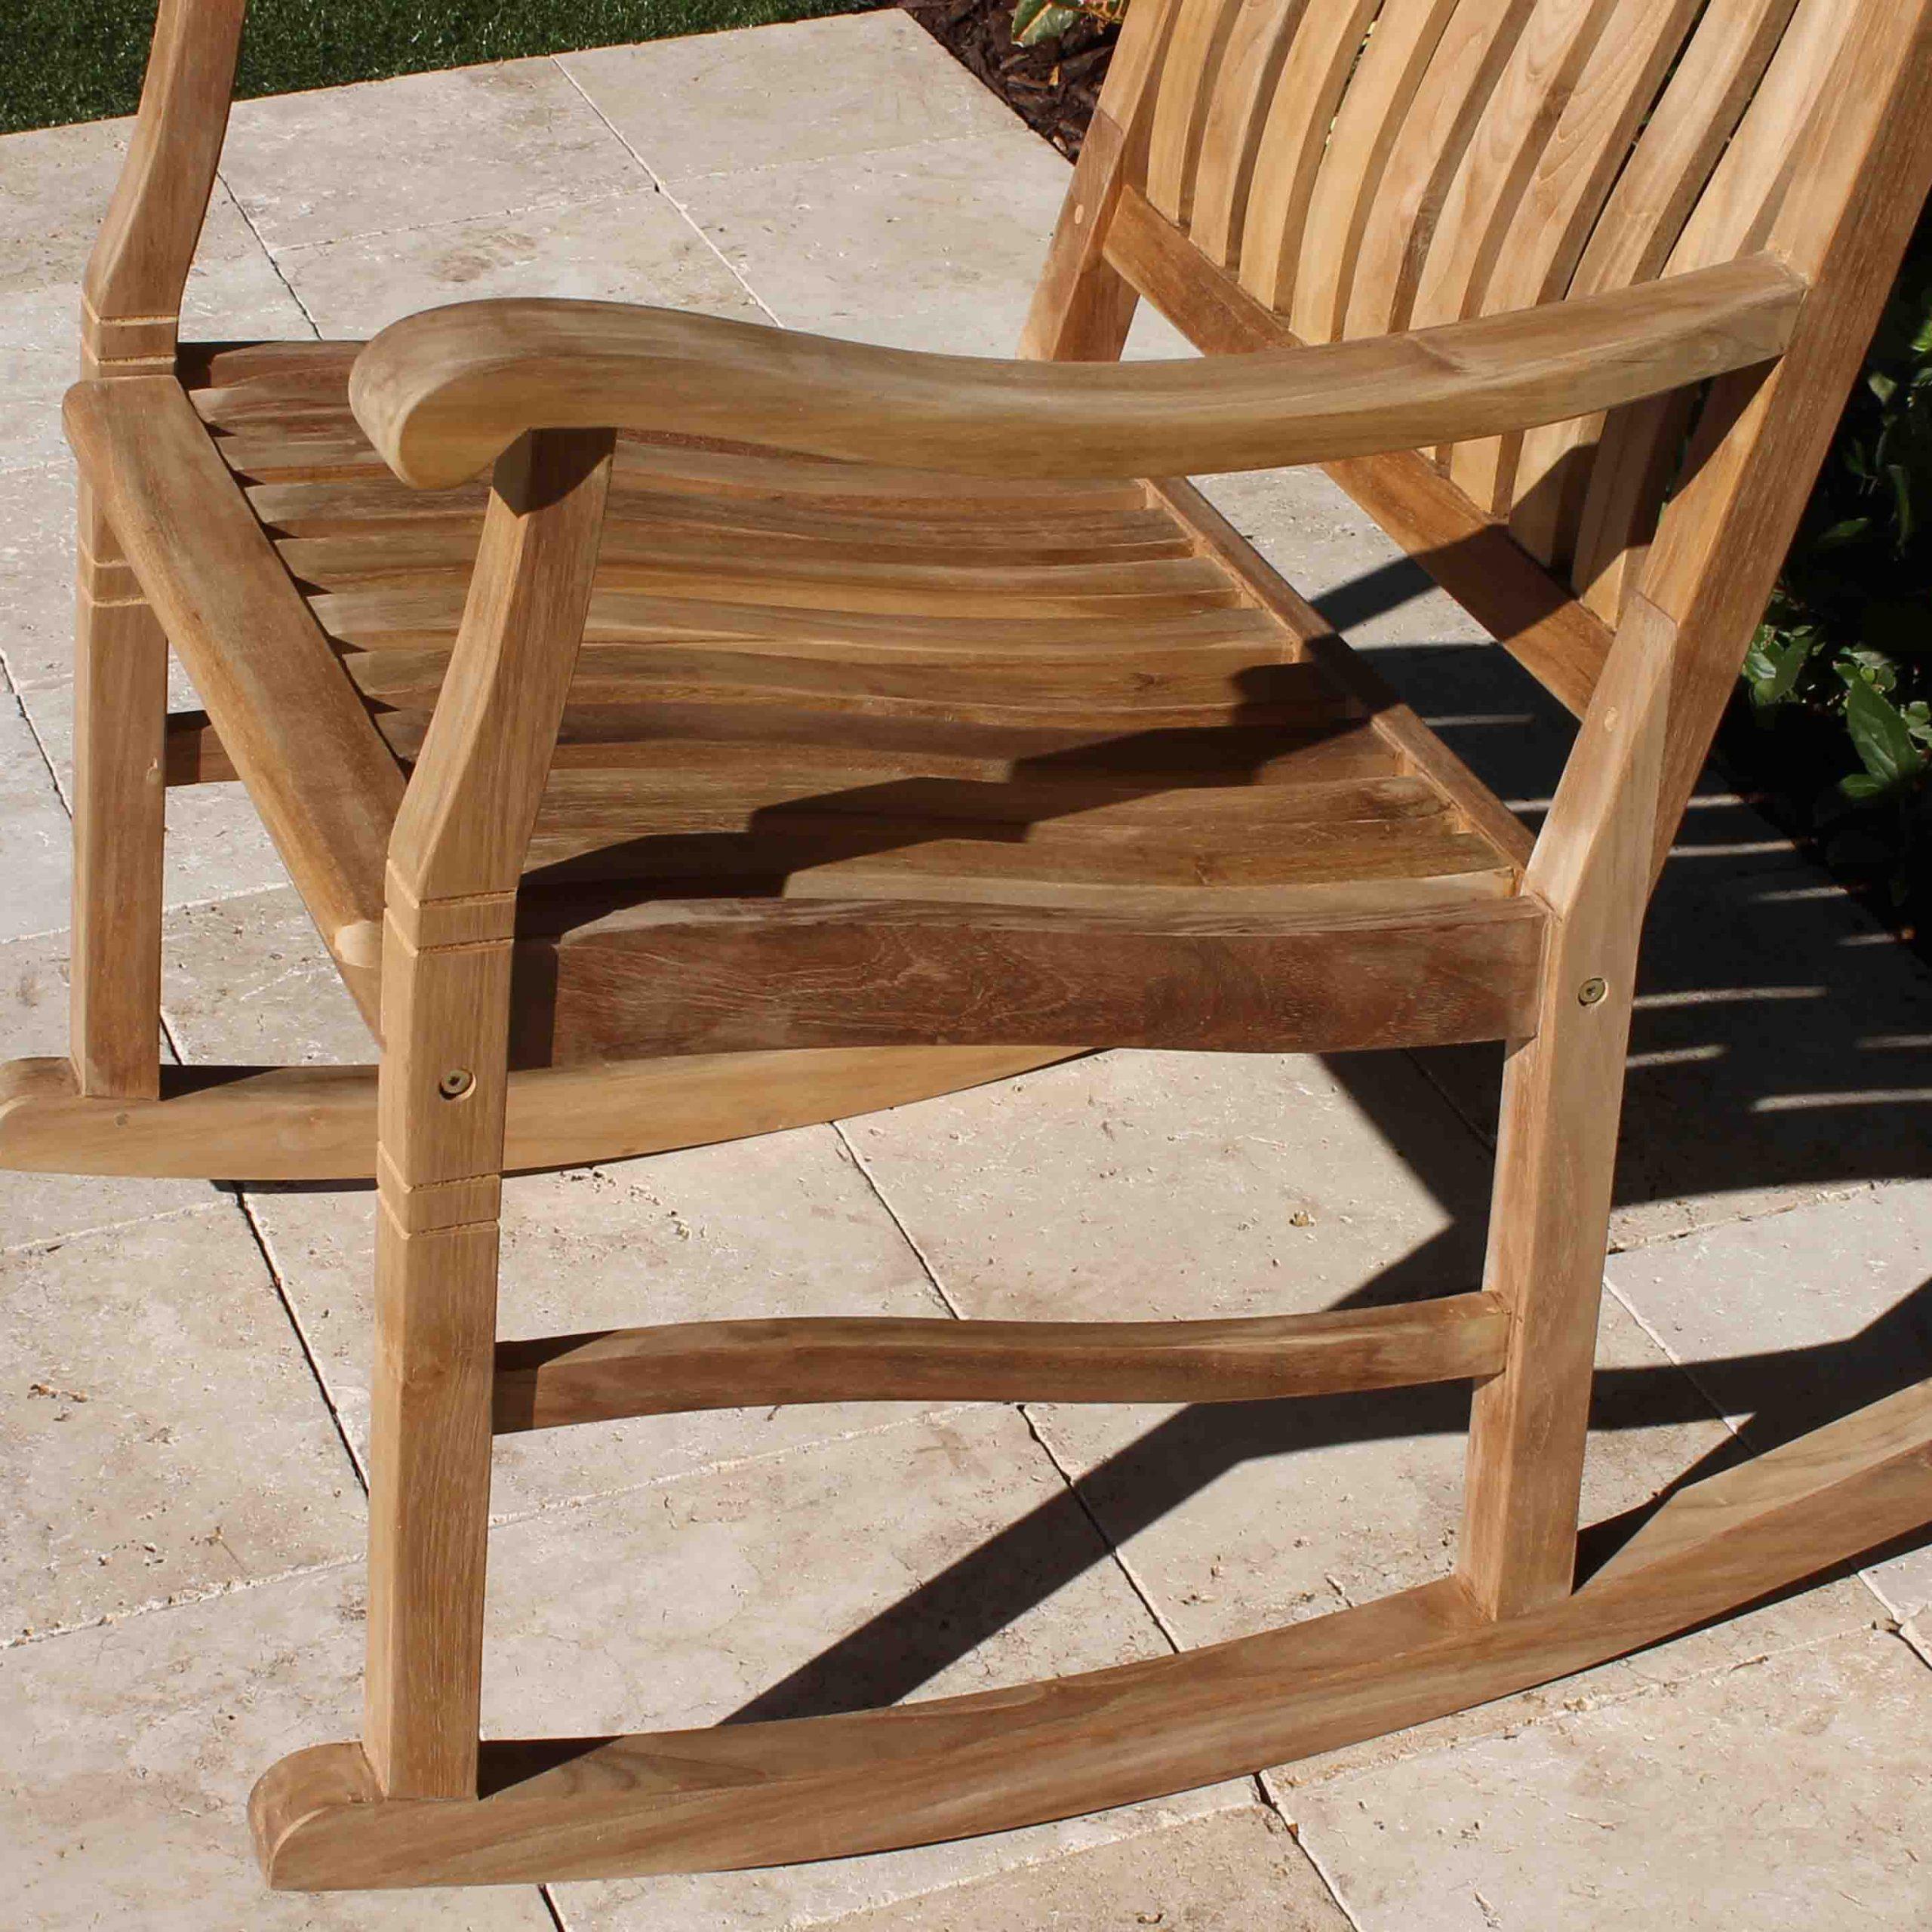 Set Of 2 Teak Rocking Chairs – Oceanic Teak Furniture In Rocking Sofa Chairs (View 5 of 15)